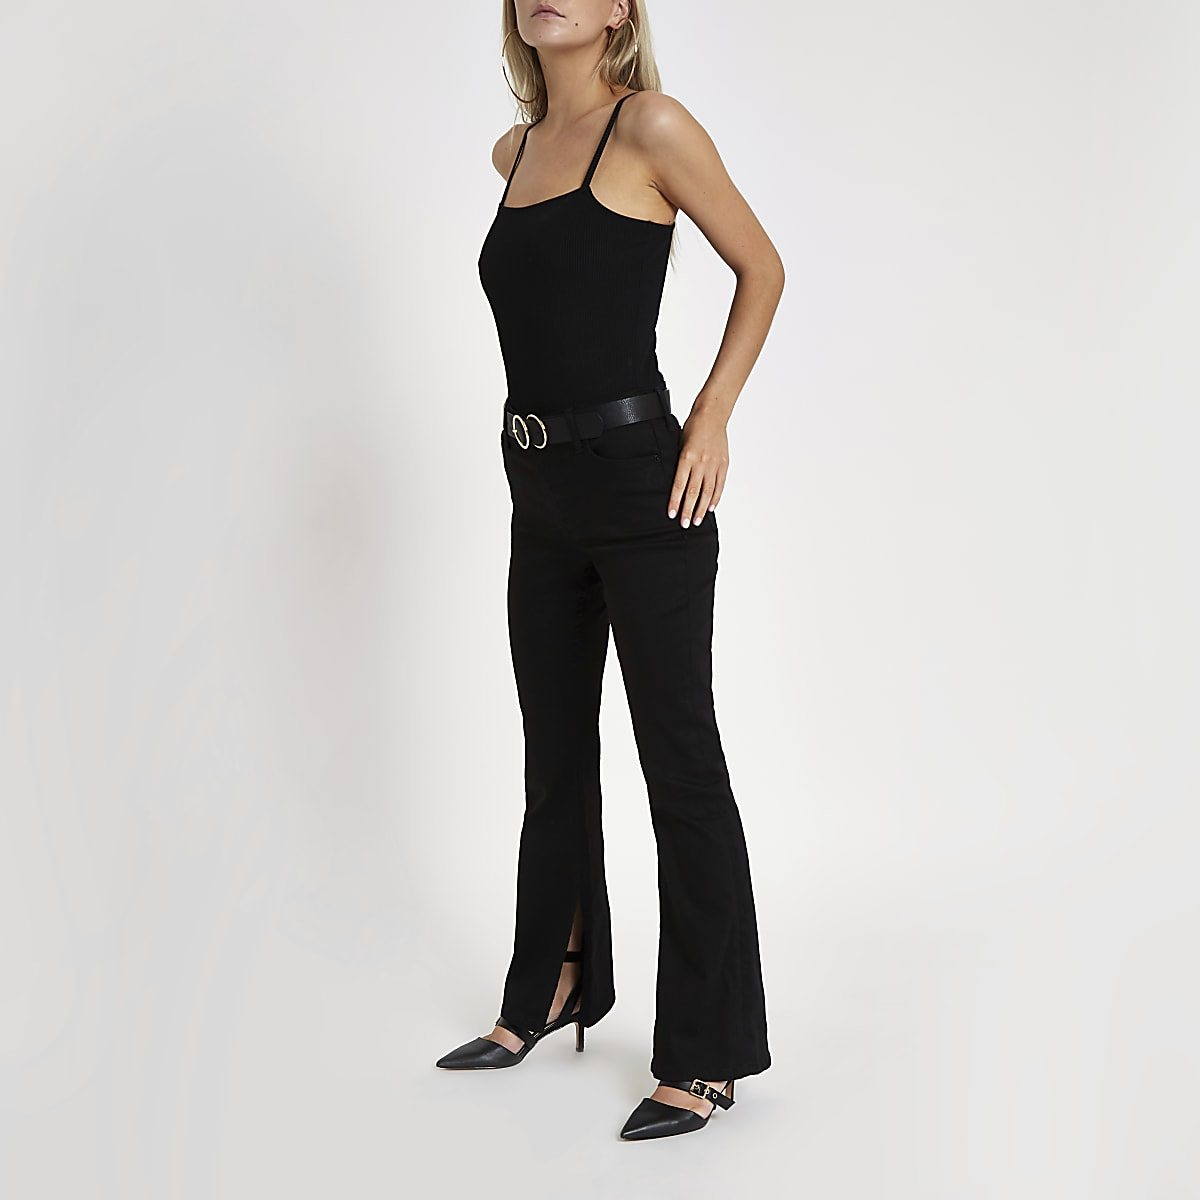 Petite black high rise flared jeans